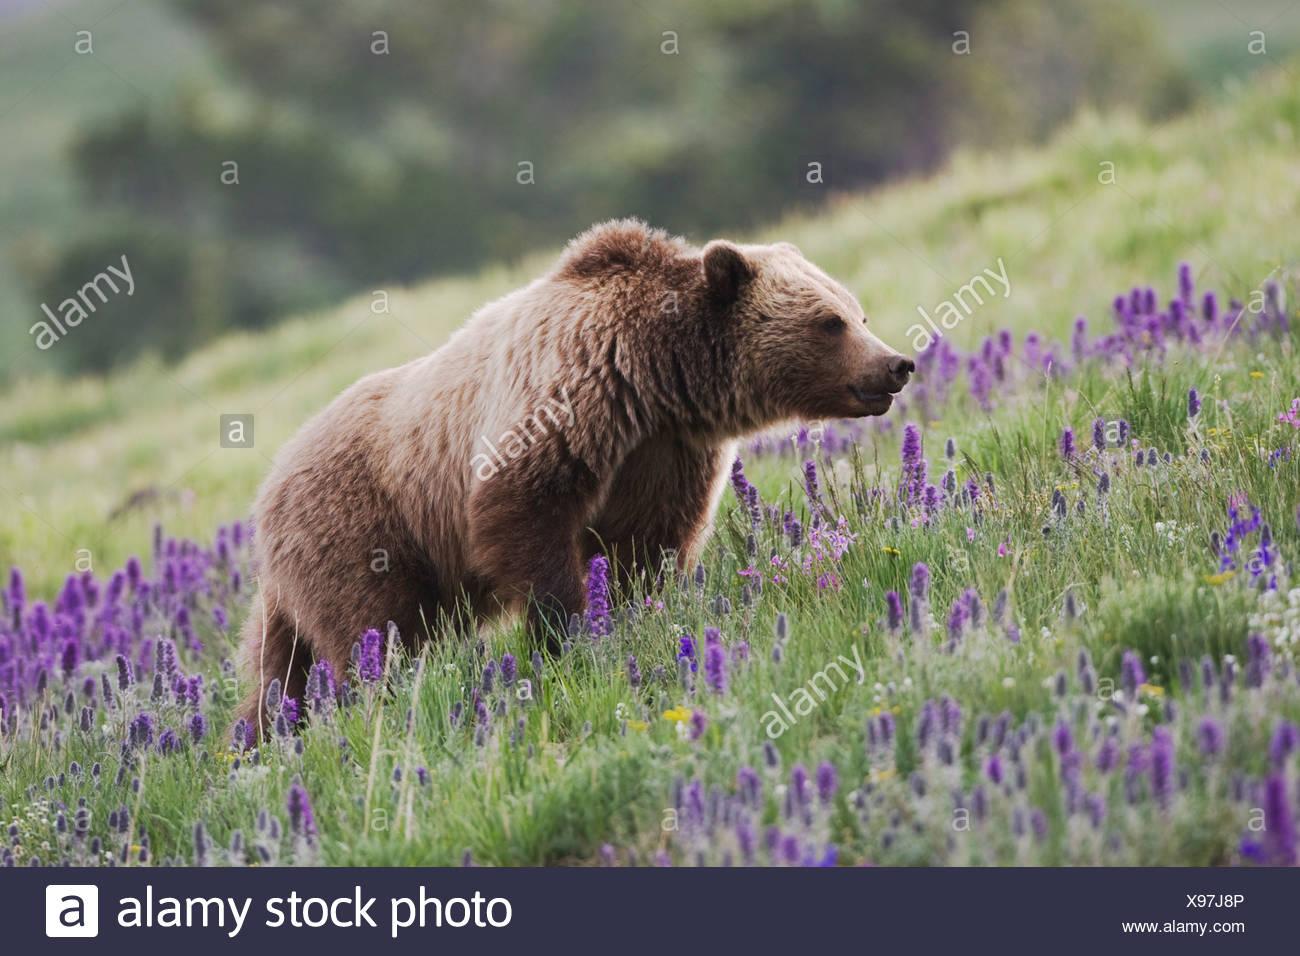 Grizzly Bear Ursus arctos horribilis adult in Purple Fringe Phacelia sericea flowers Yellowstone National Park Wyoming USA - Stock Image